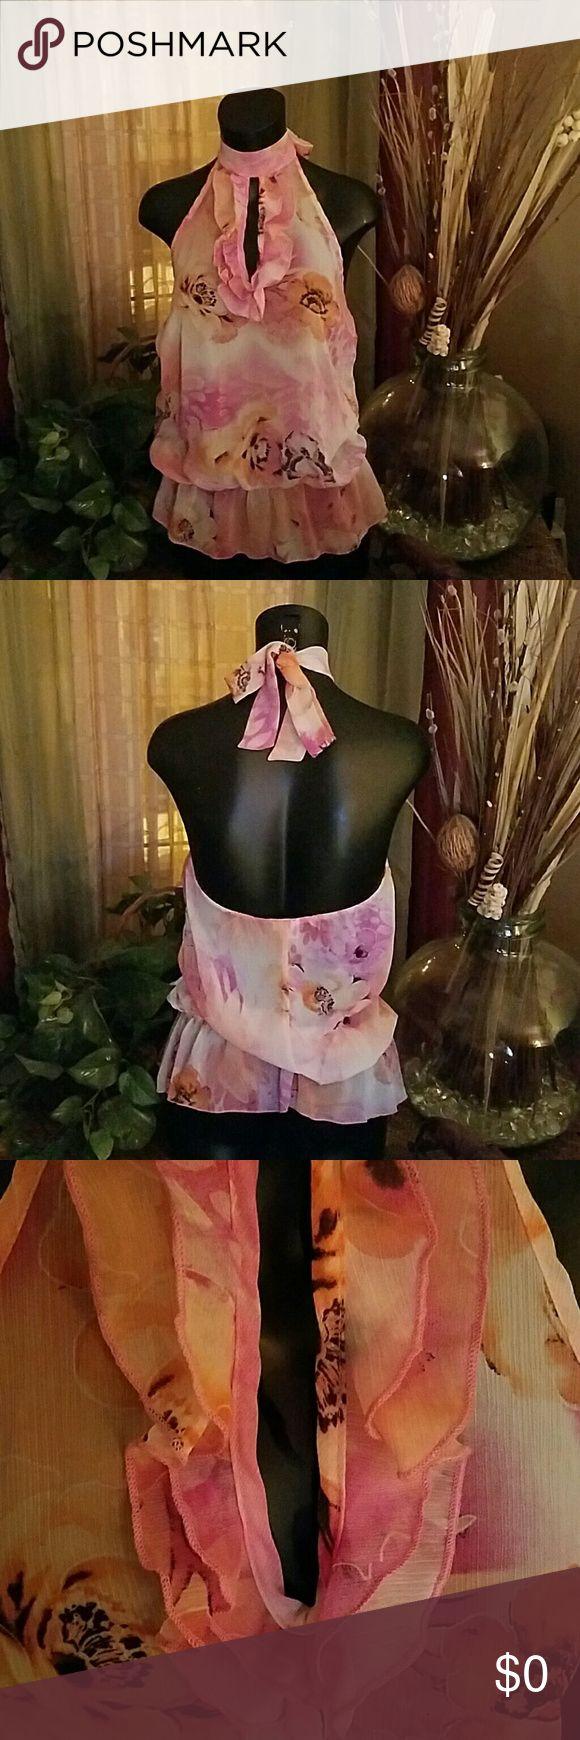 Very Sexy Sheer Top Sheer material, open back, elastic waist. Never worn. Tops Blouses